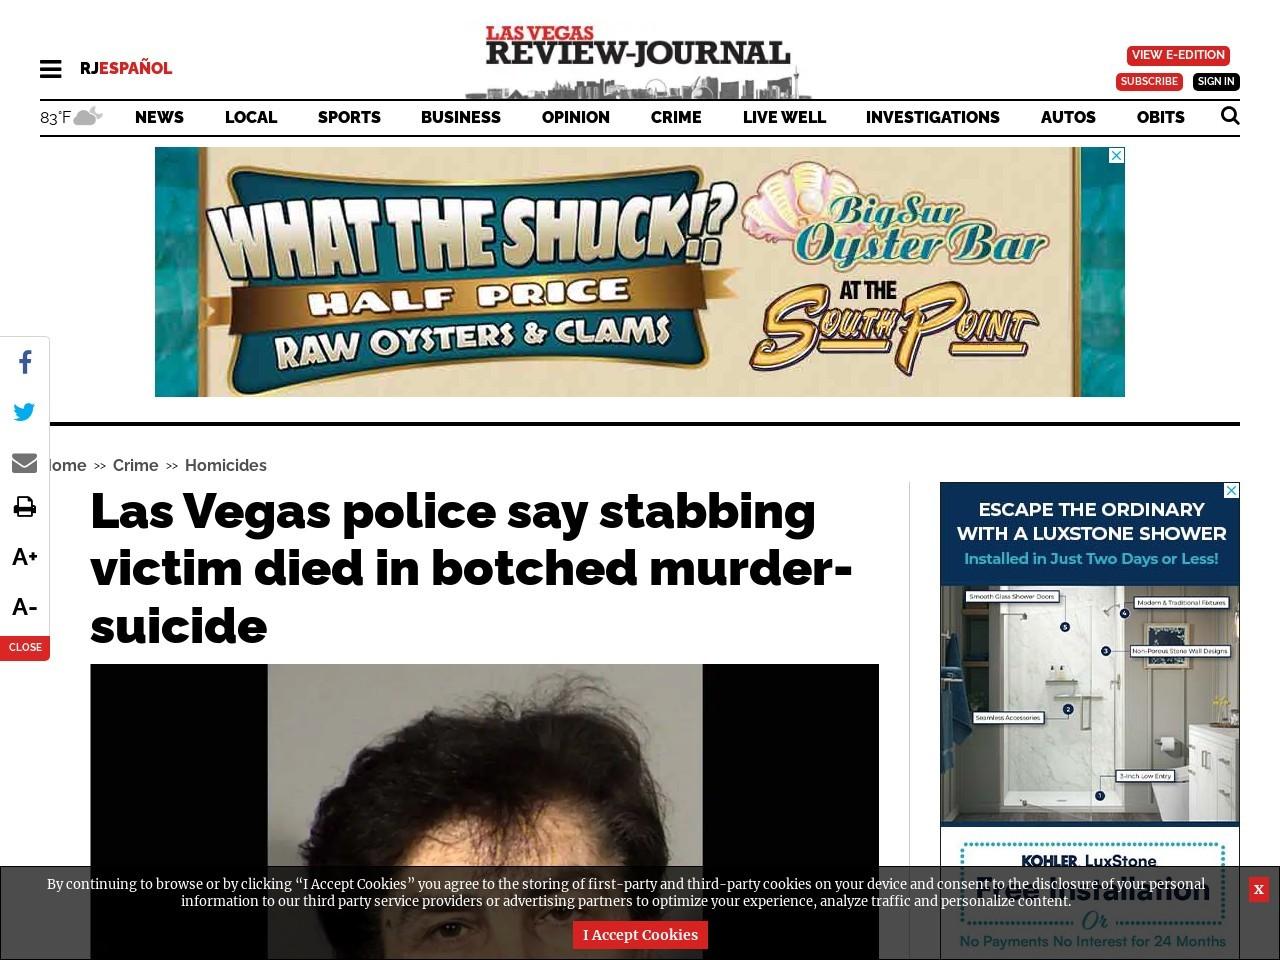 Las Vegas police say stabbing victim died in botched murder-suicide